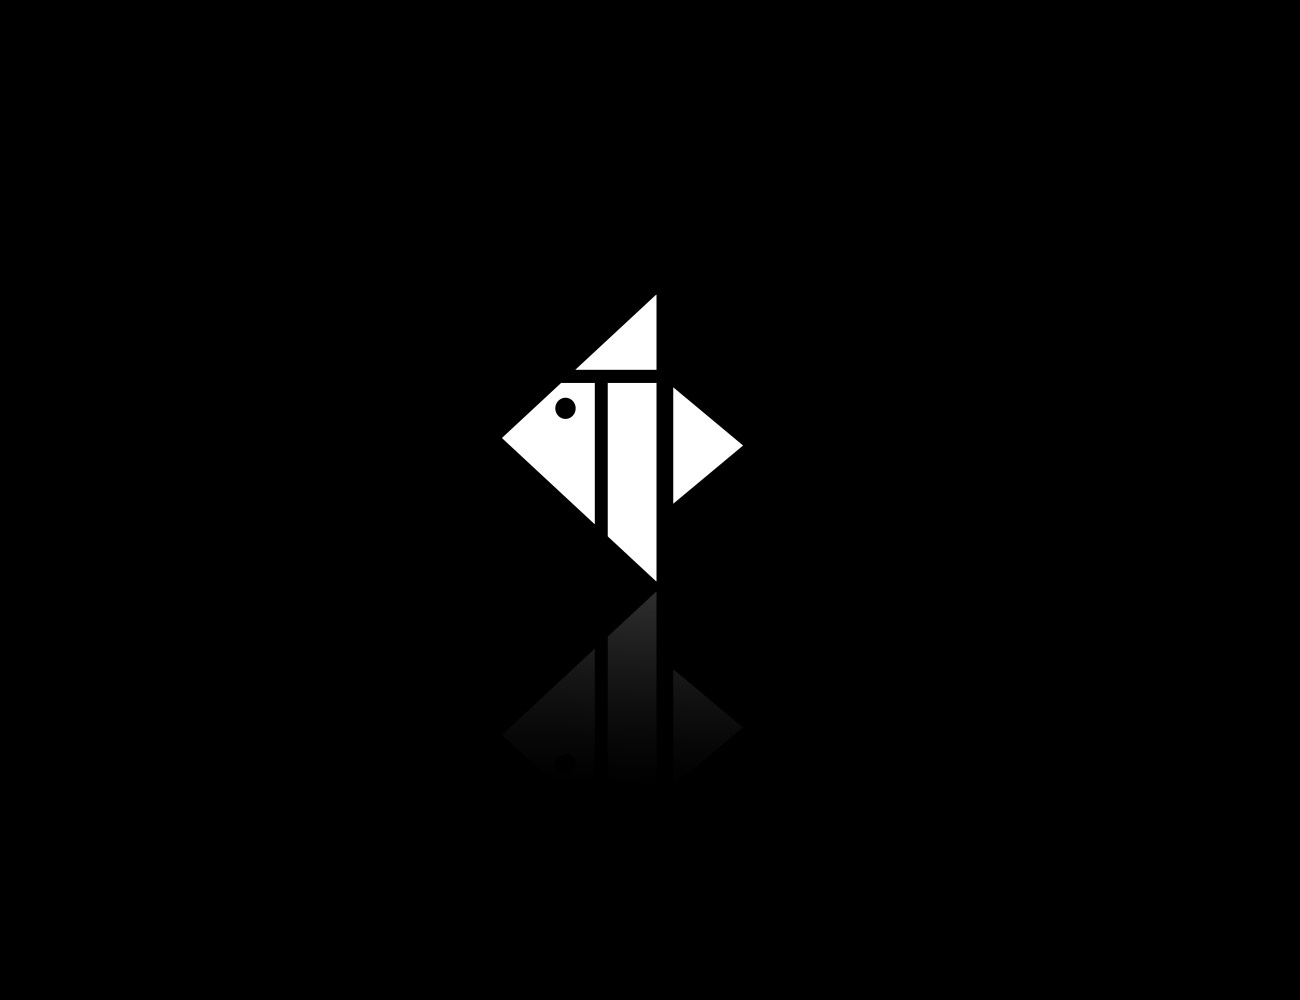 tetraslogodesign1